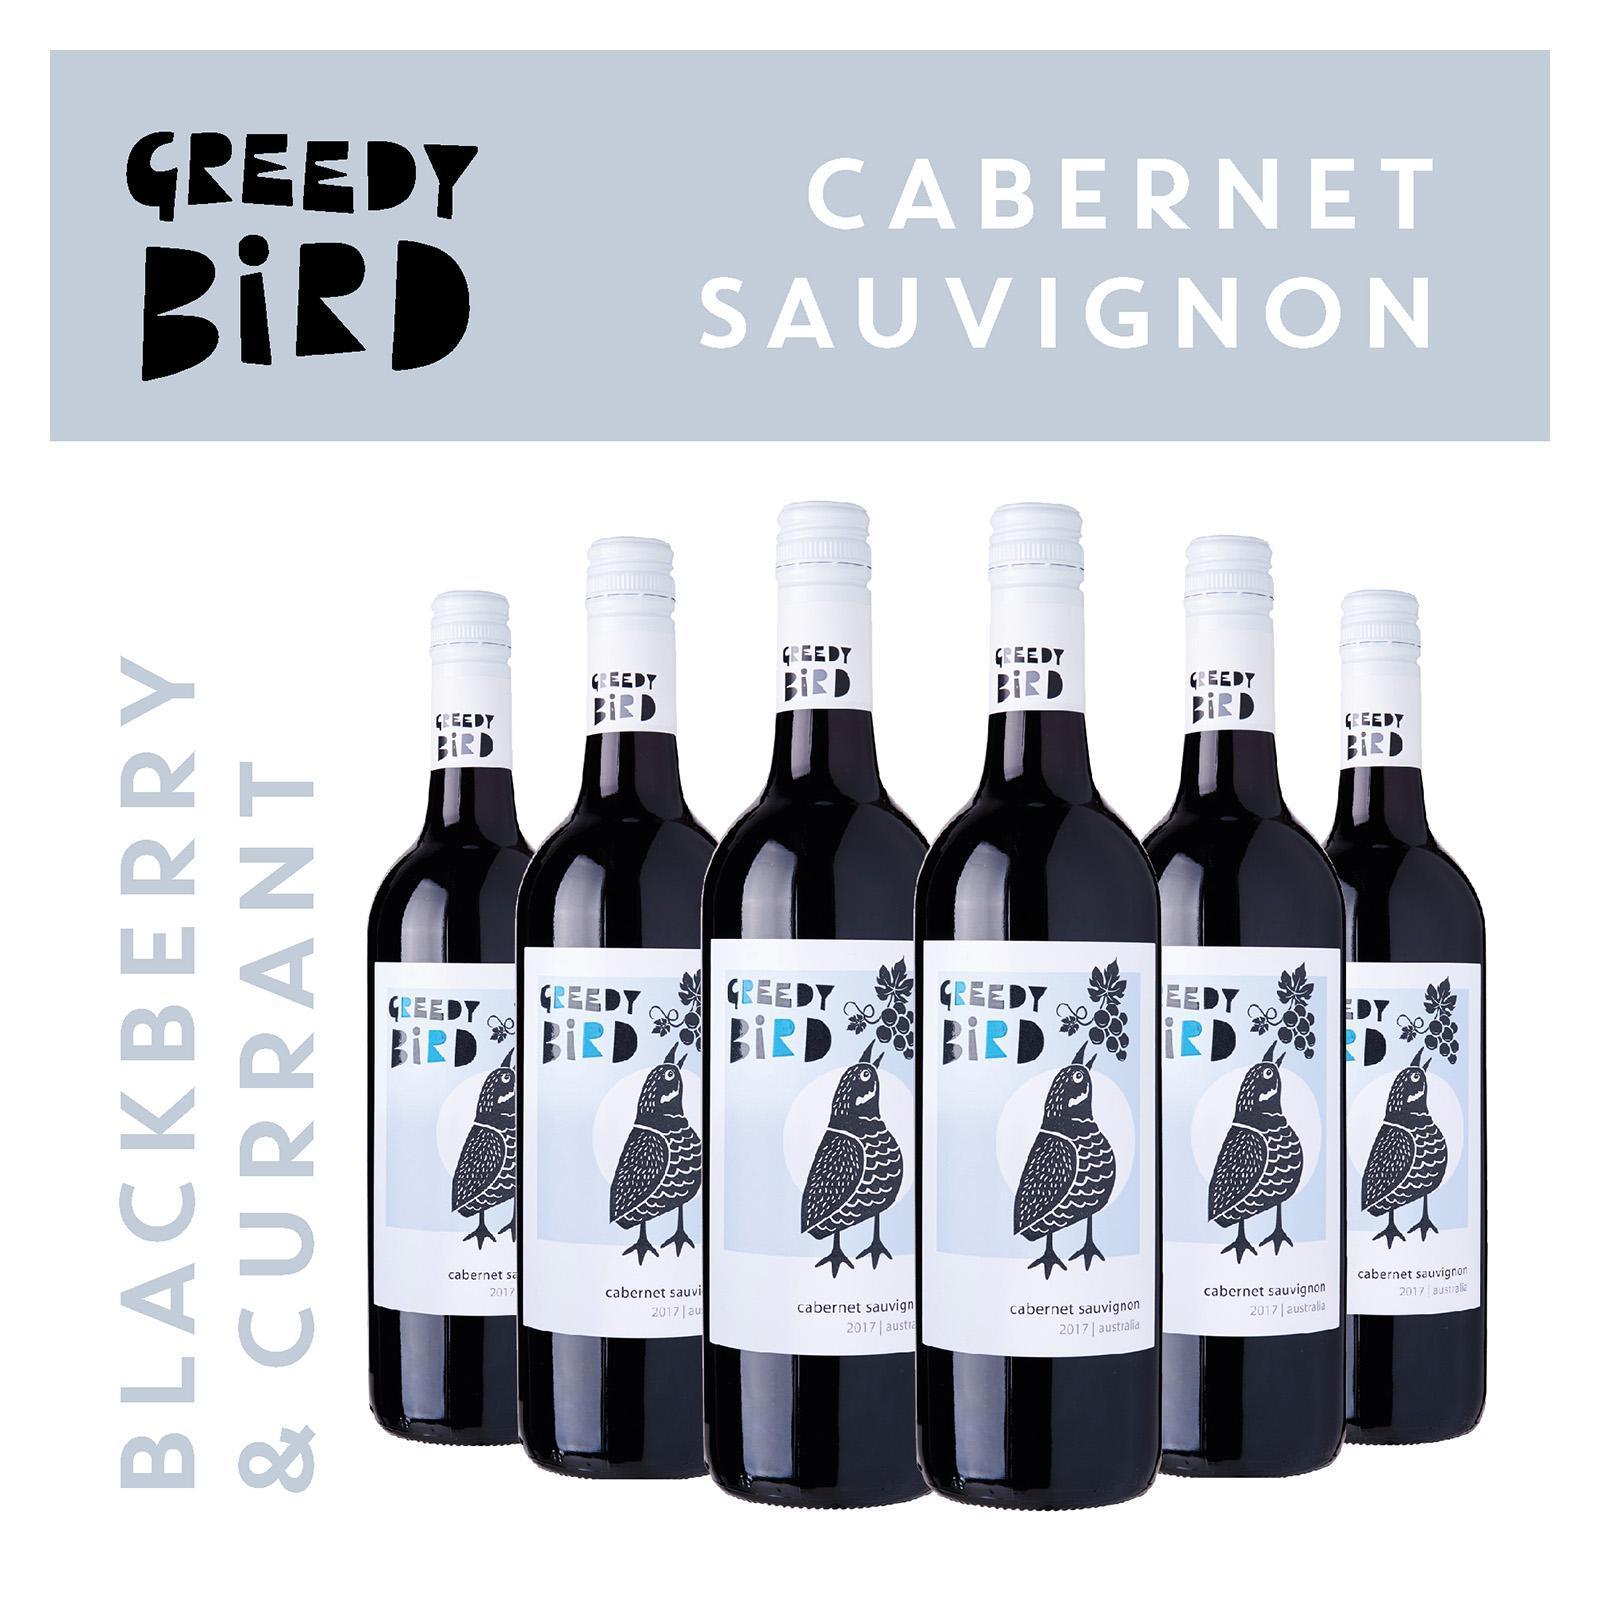 Greedy Bird South Australia Cabernet Sauvignon - Case Red Wine